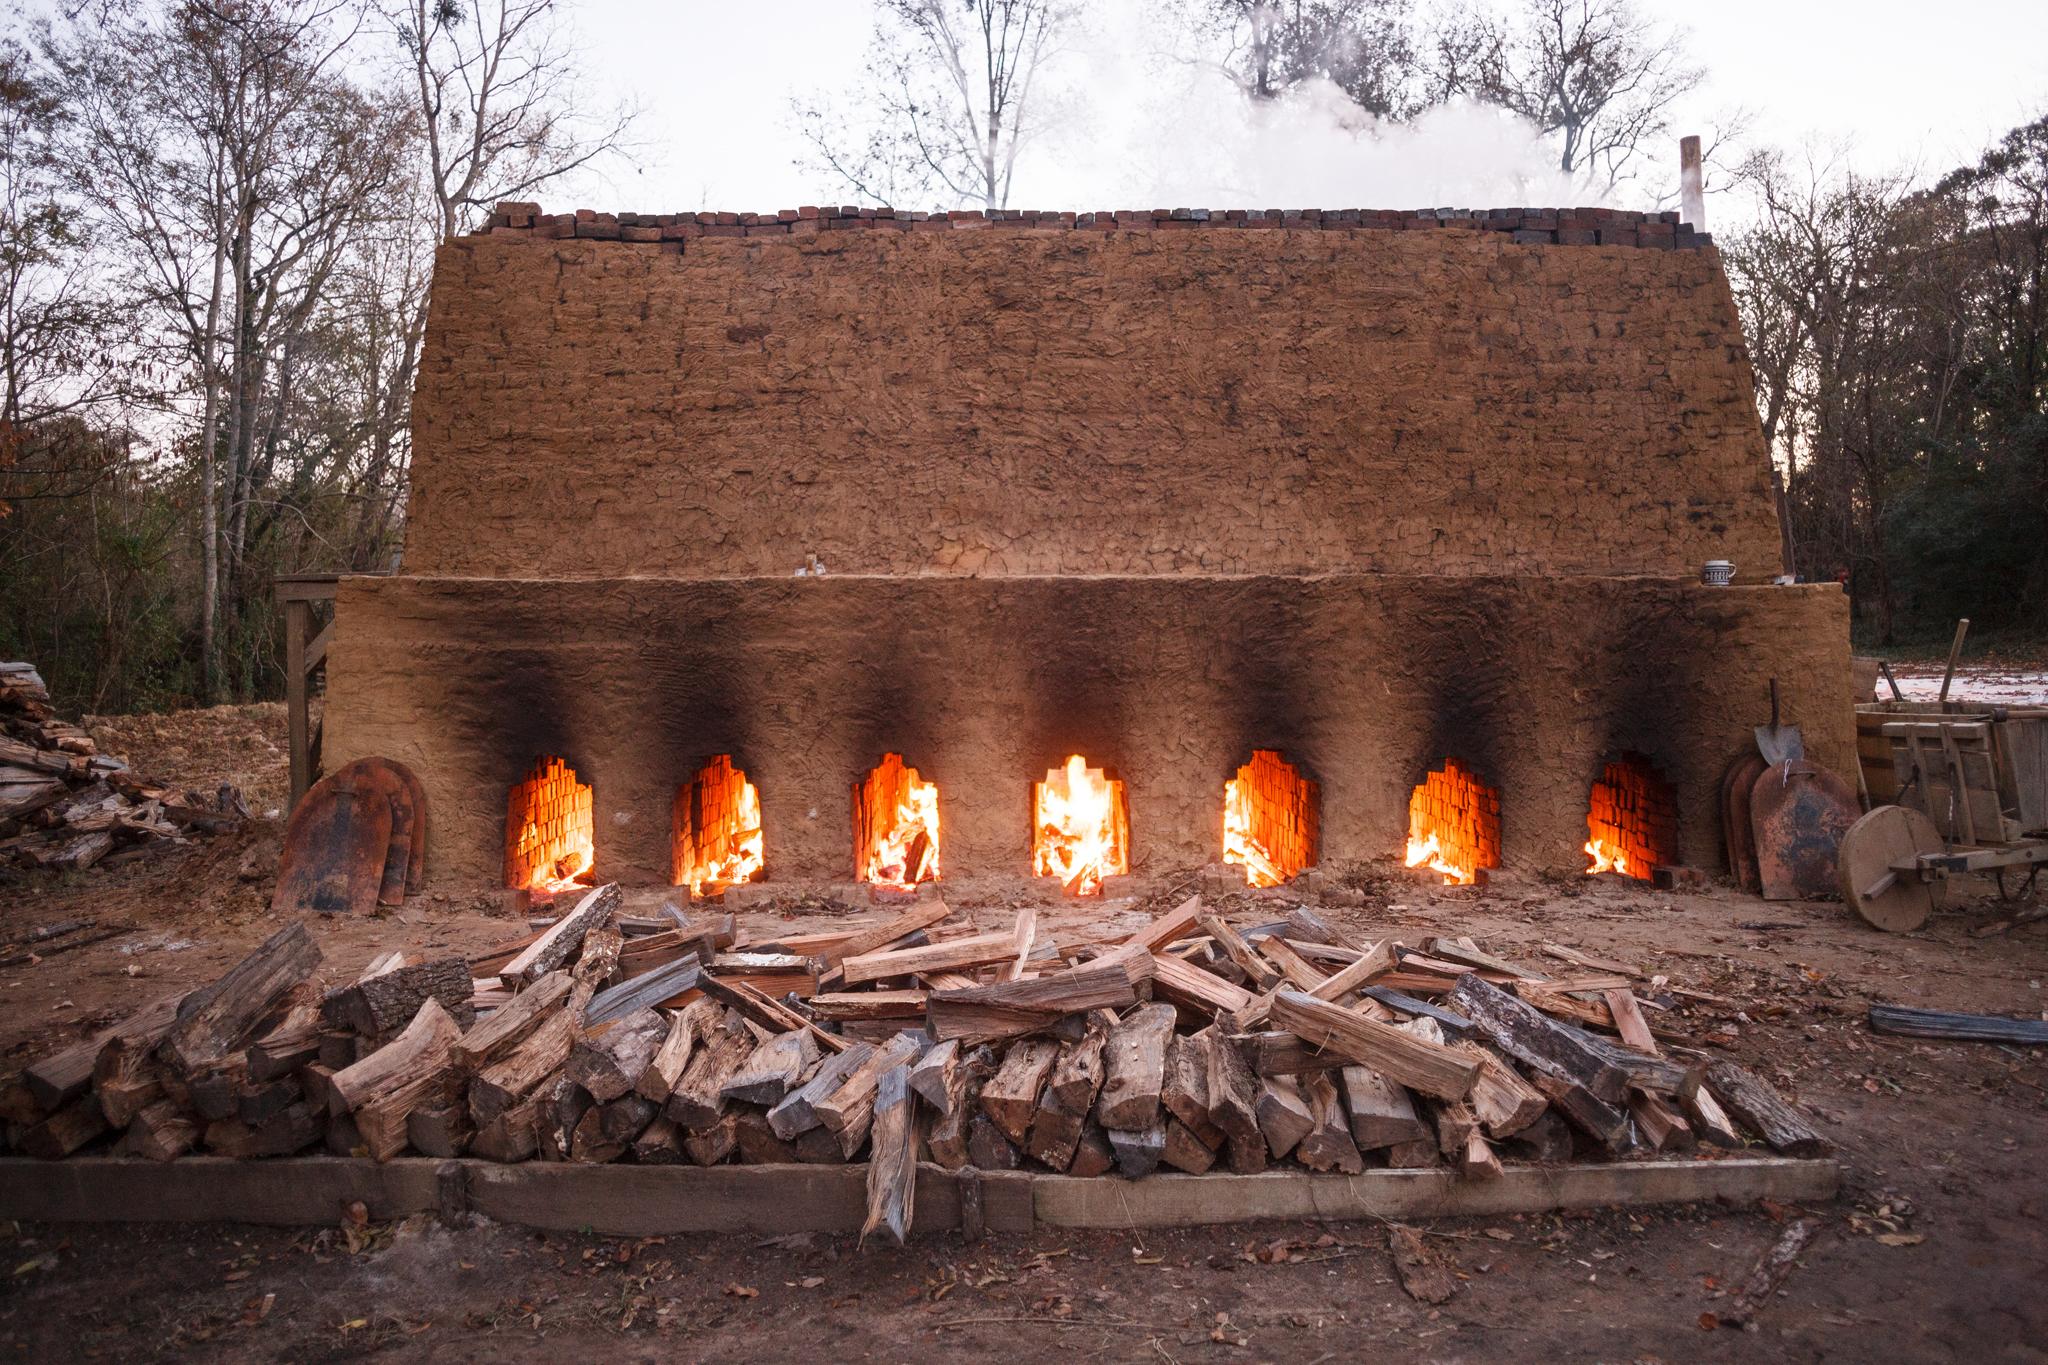 Burning of Bricks  Civil Engineers PK